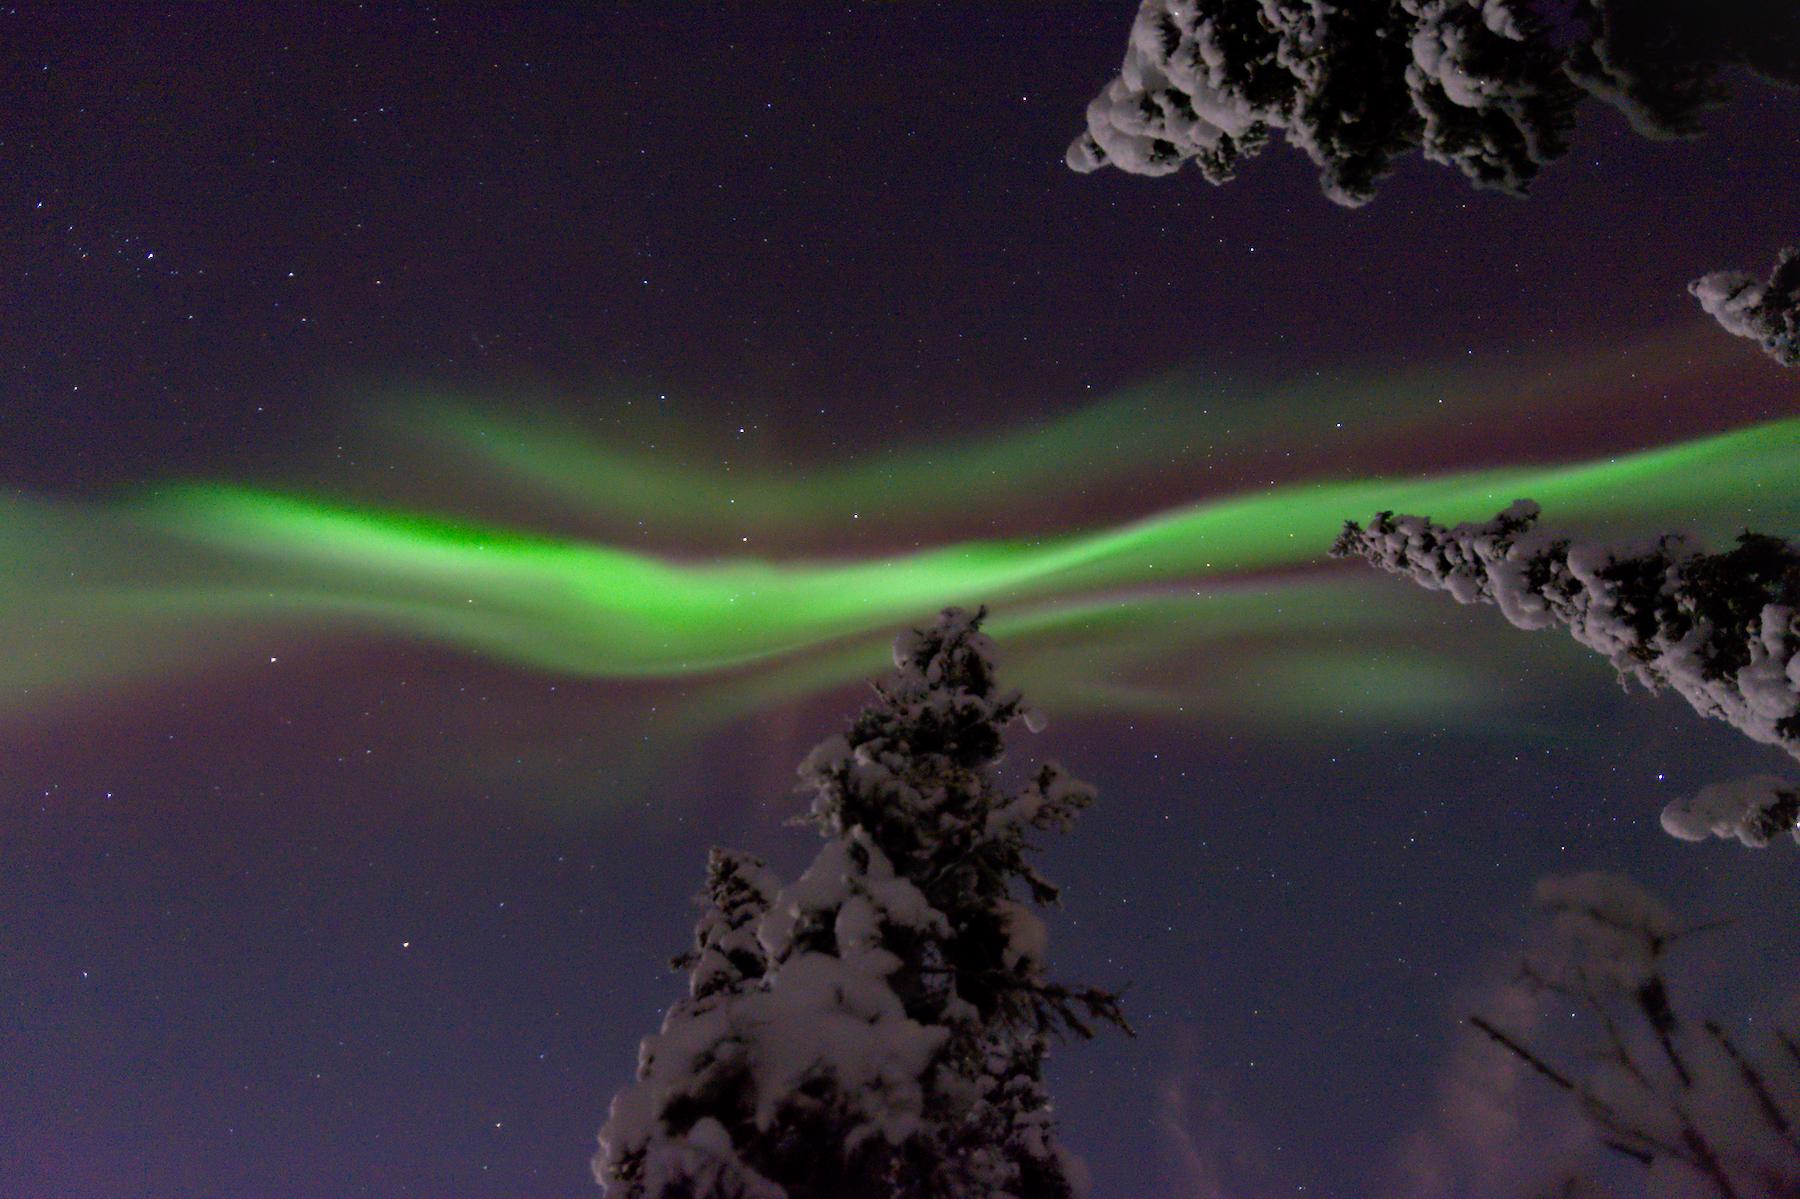 Aurora borealis over a boreal forest